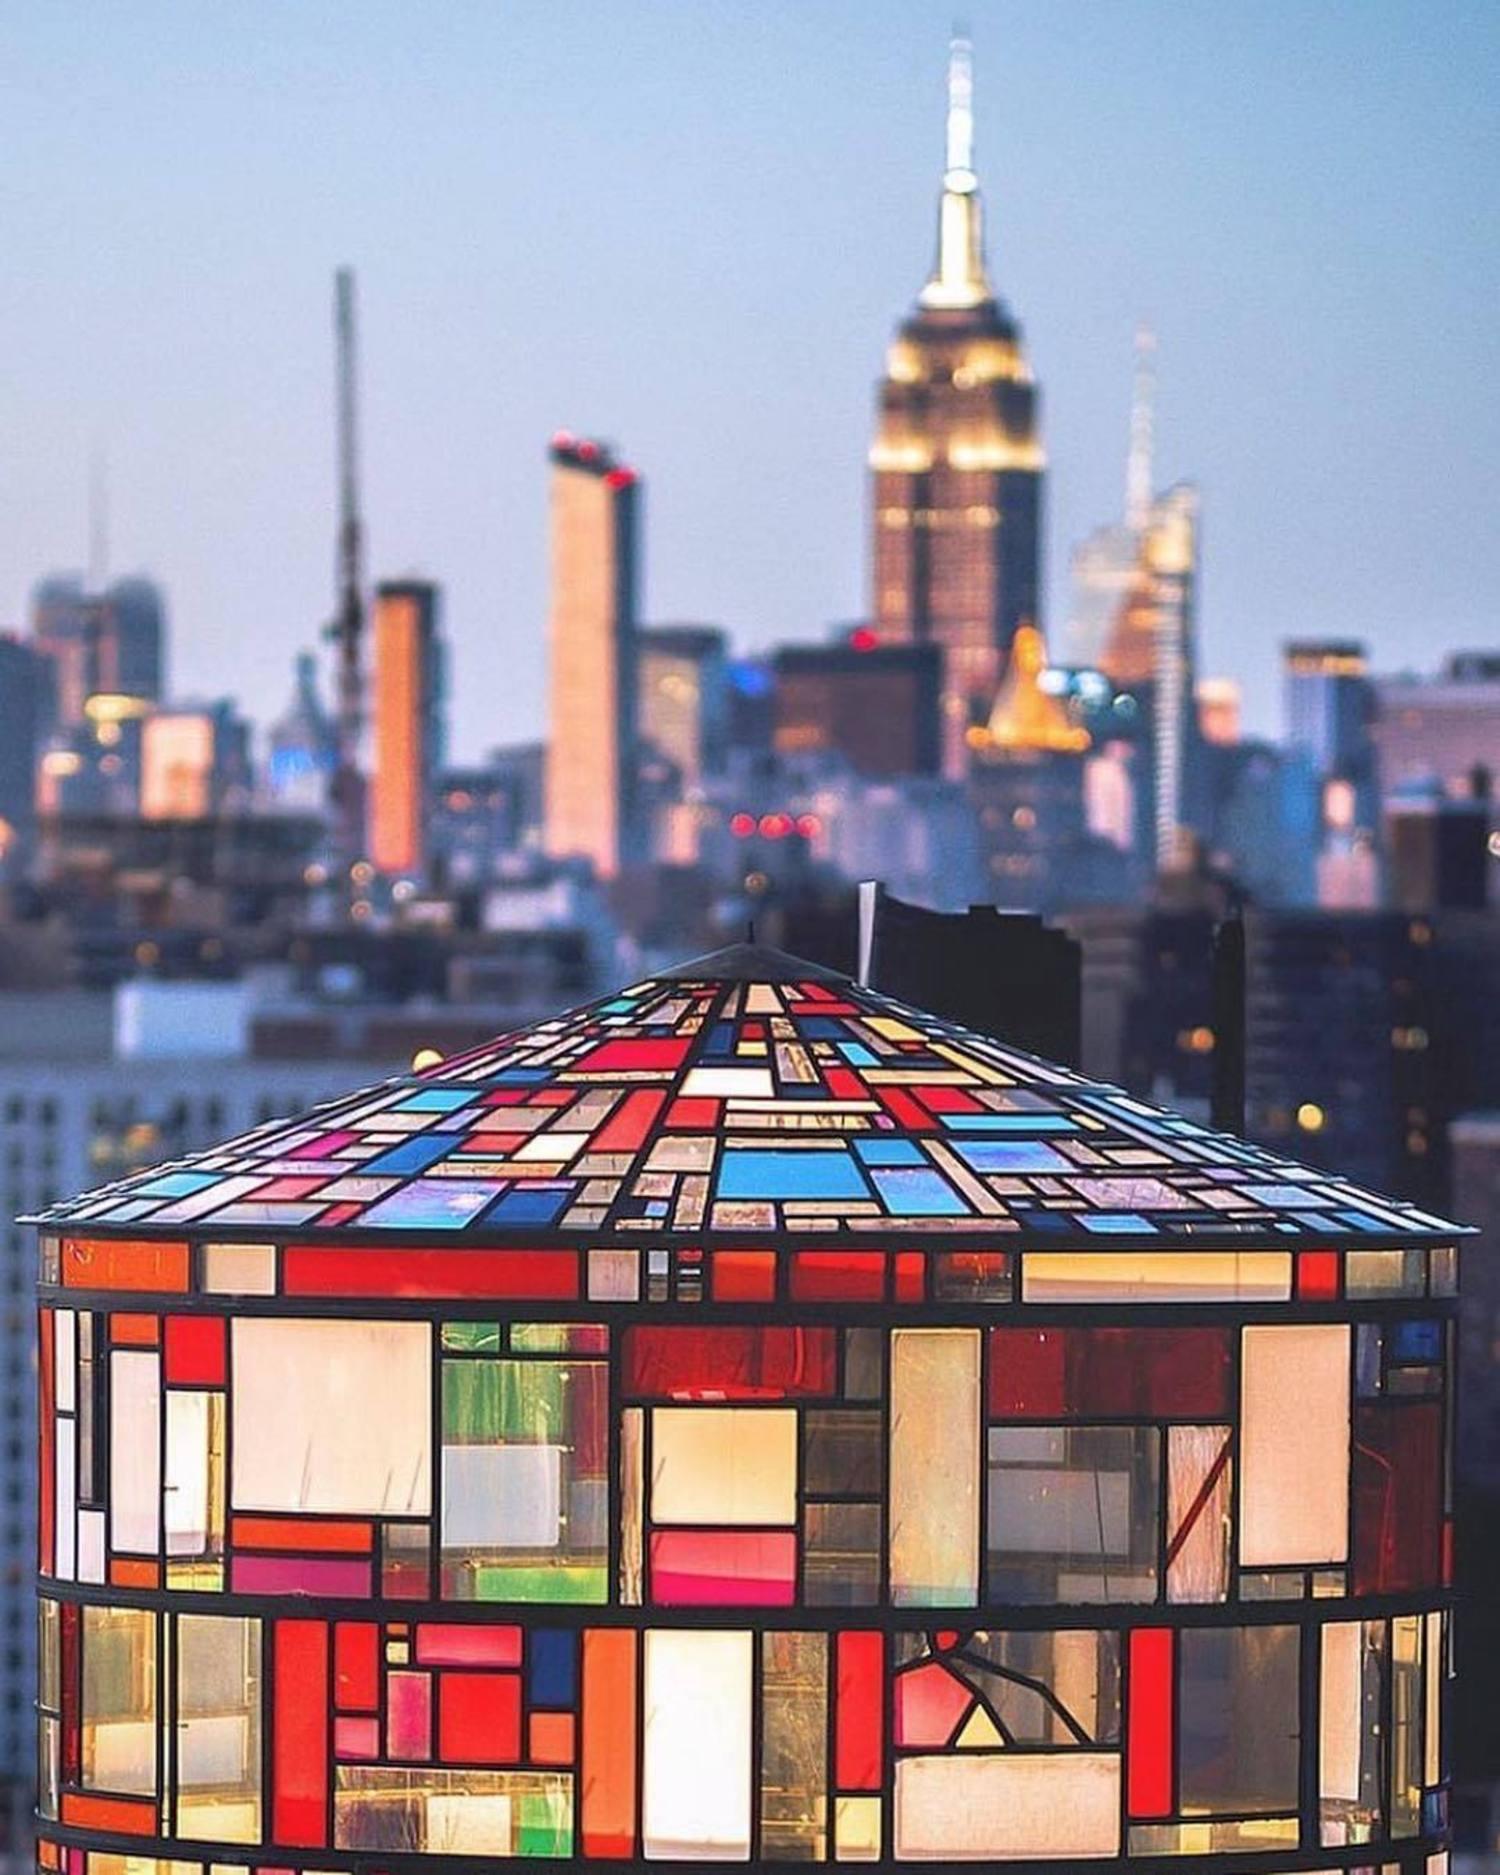 New York, New York. Photo via @beholdingeye #viewingnyc #nyc #newyorkcity #newyork #tomfruin #tomfruinwatertower